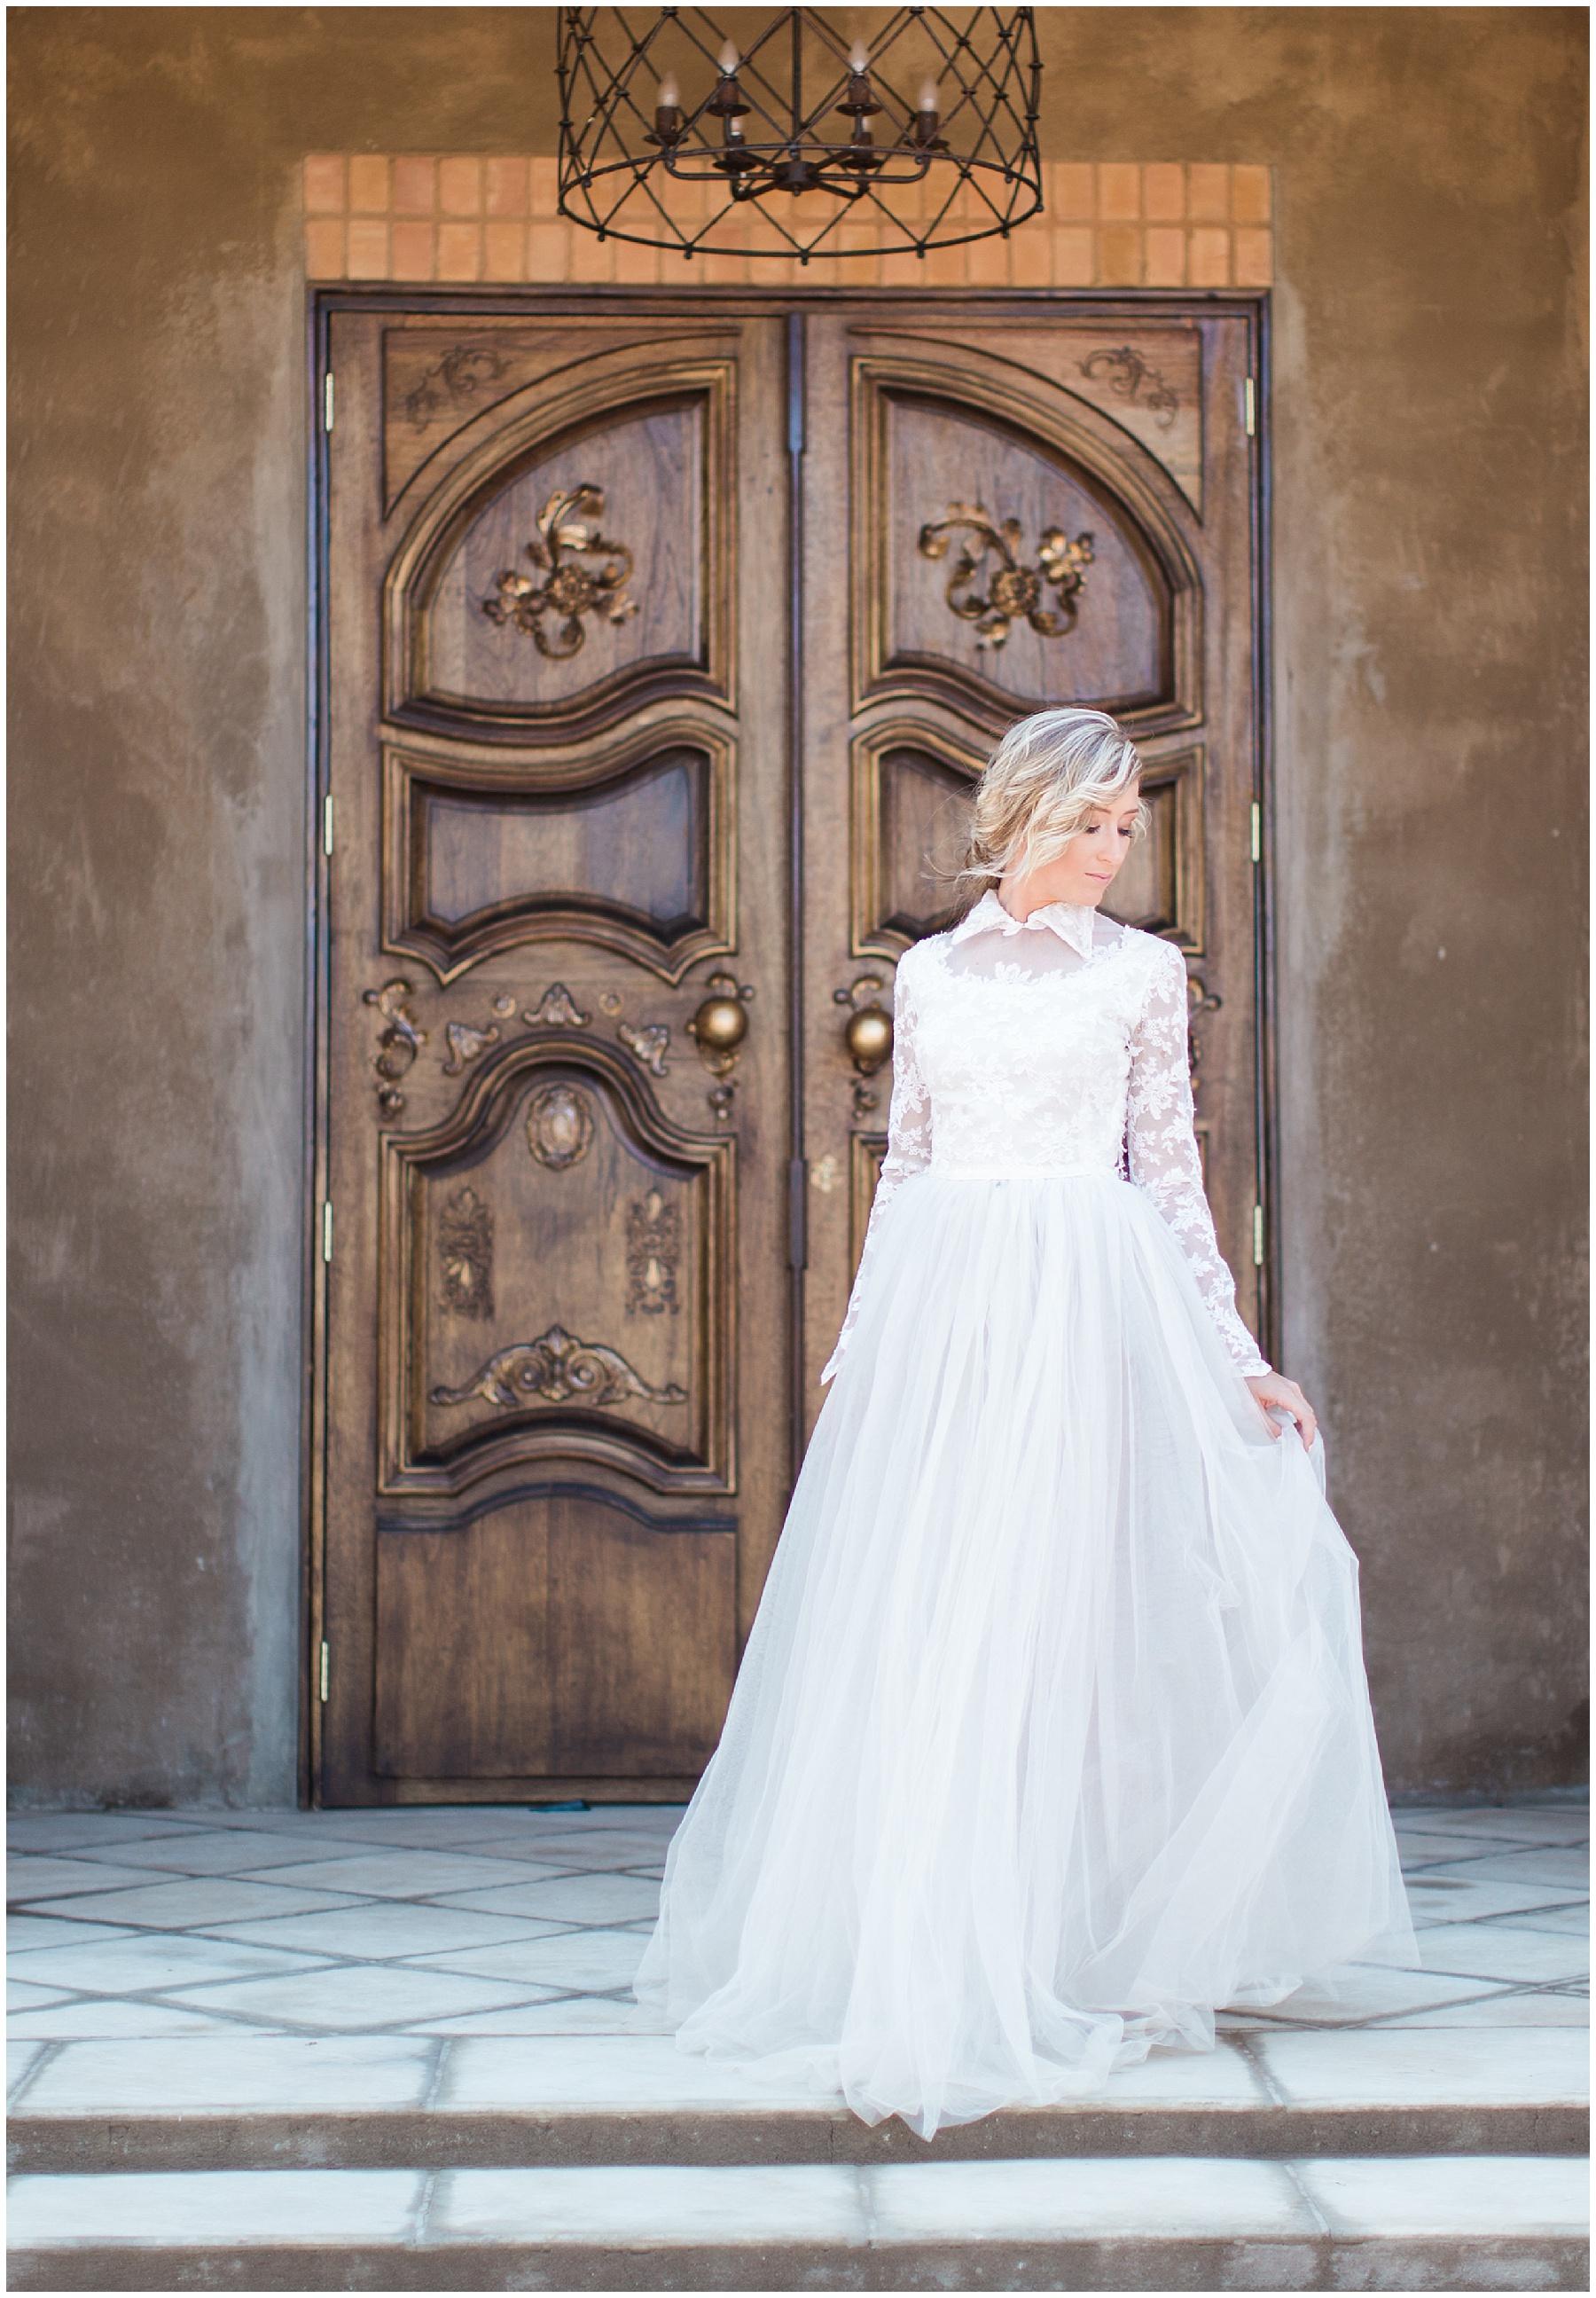 AliciaLandman_JoleneandZander_Wedding_The Pretty Blog_0446.jpg